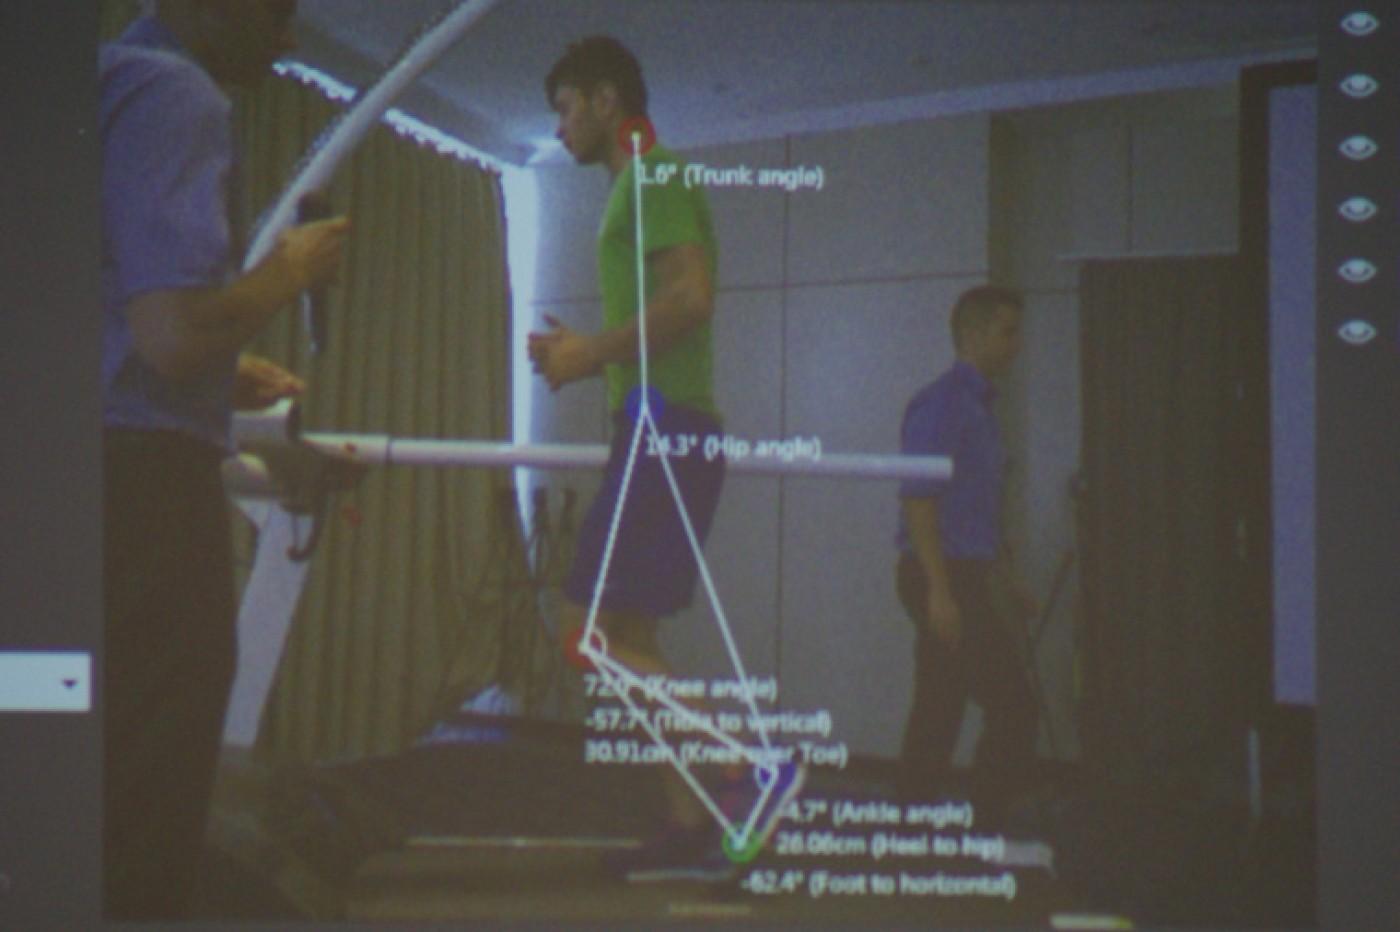 h/p/cosmos treadmills for rehabilitation, biomechanics & gait analysis